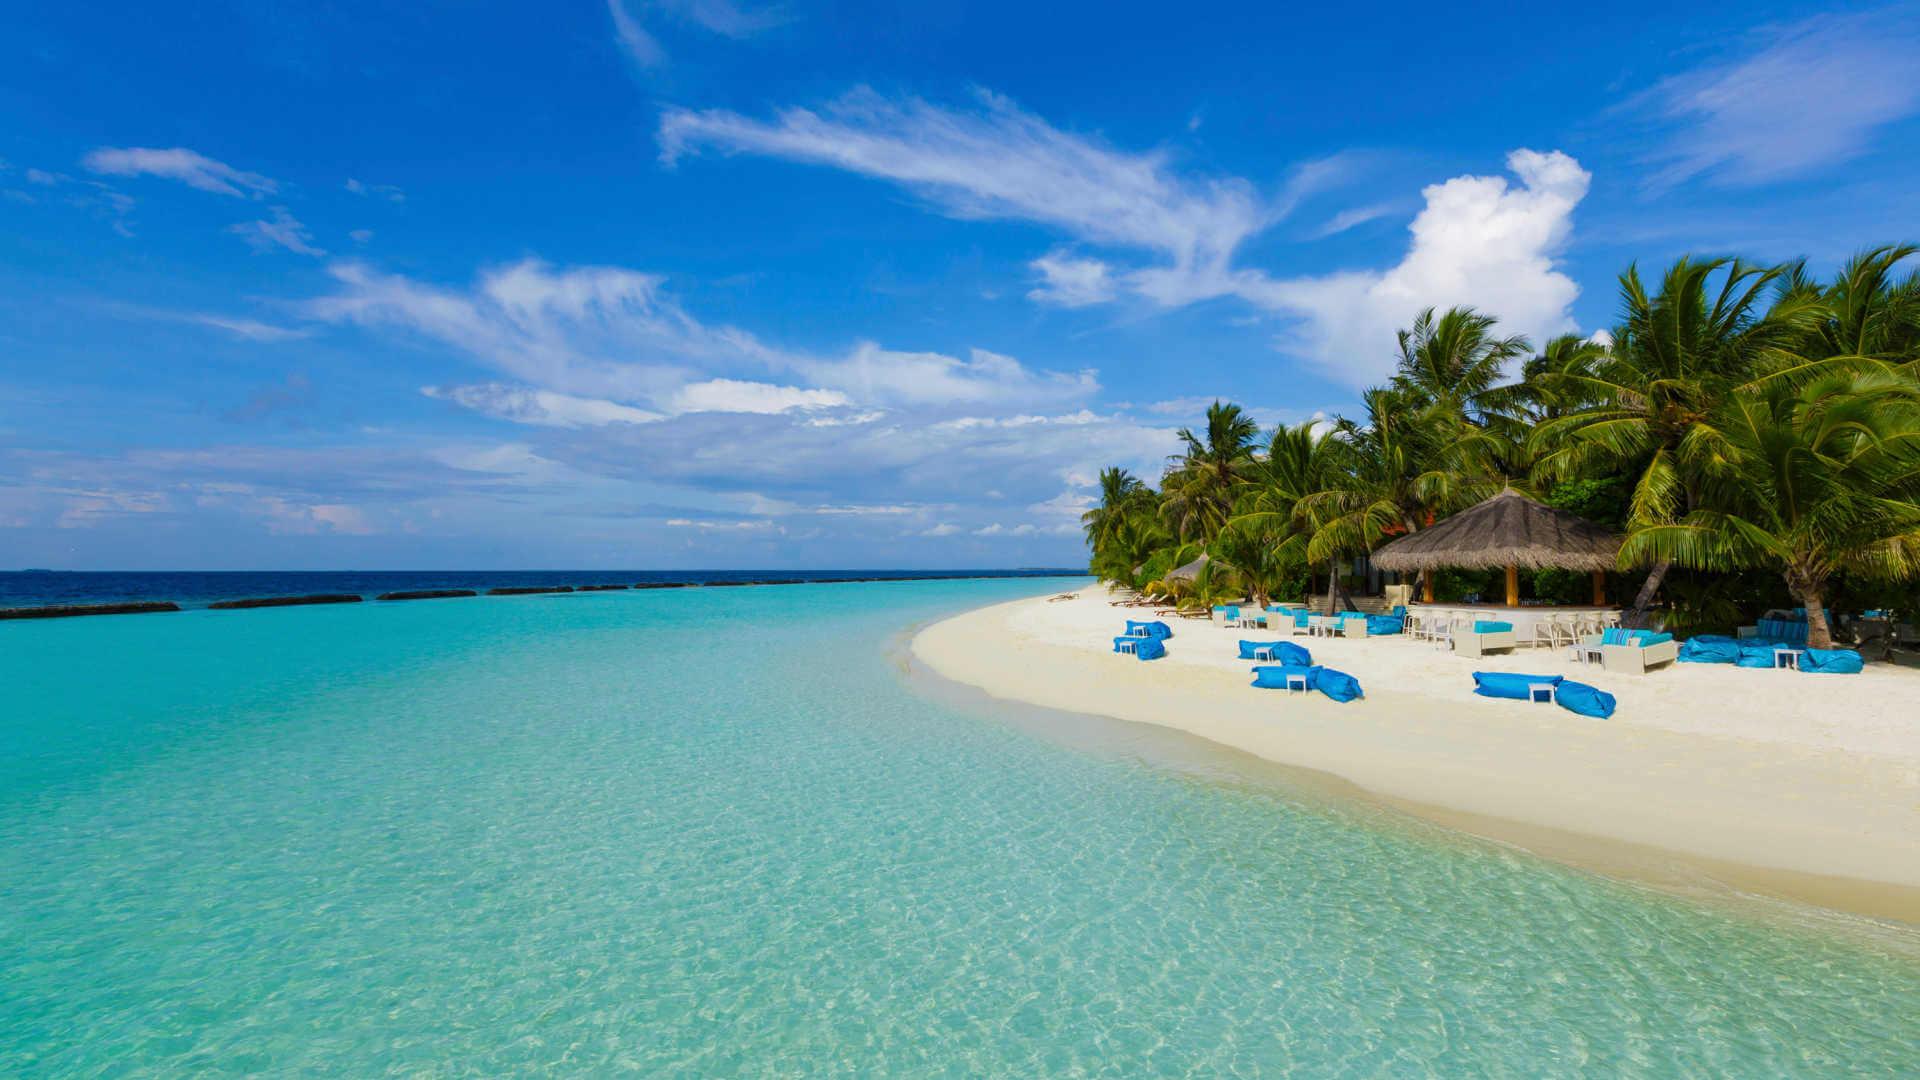 Maafushi-Maldives Holiday Travel and Tour Package